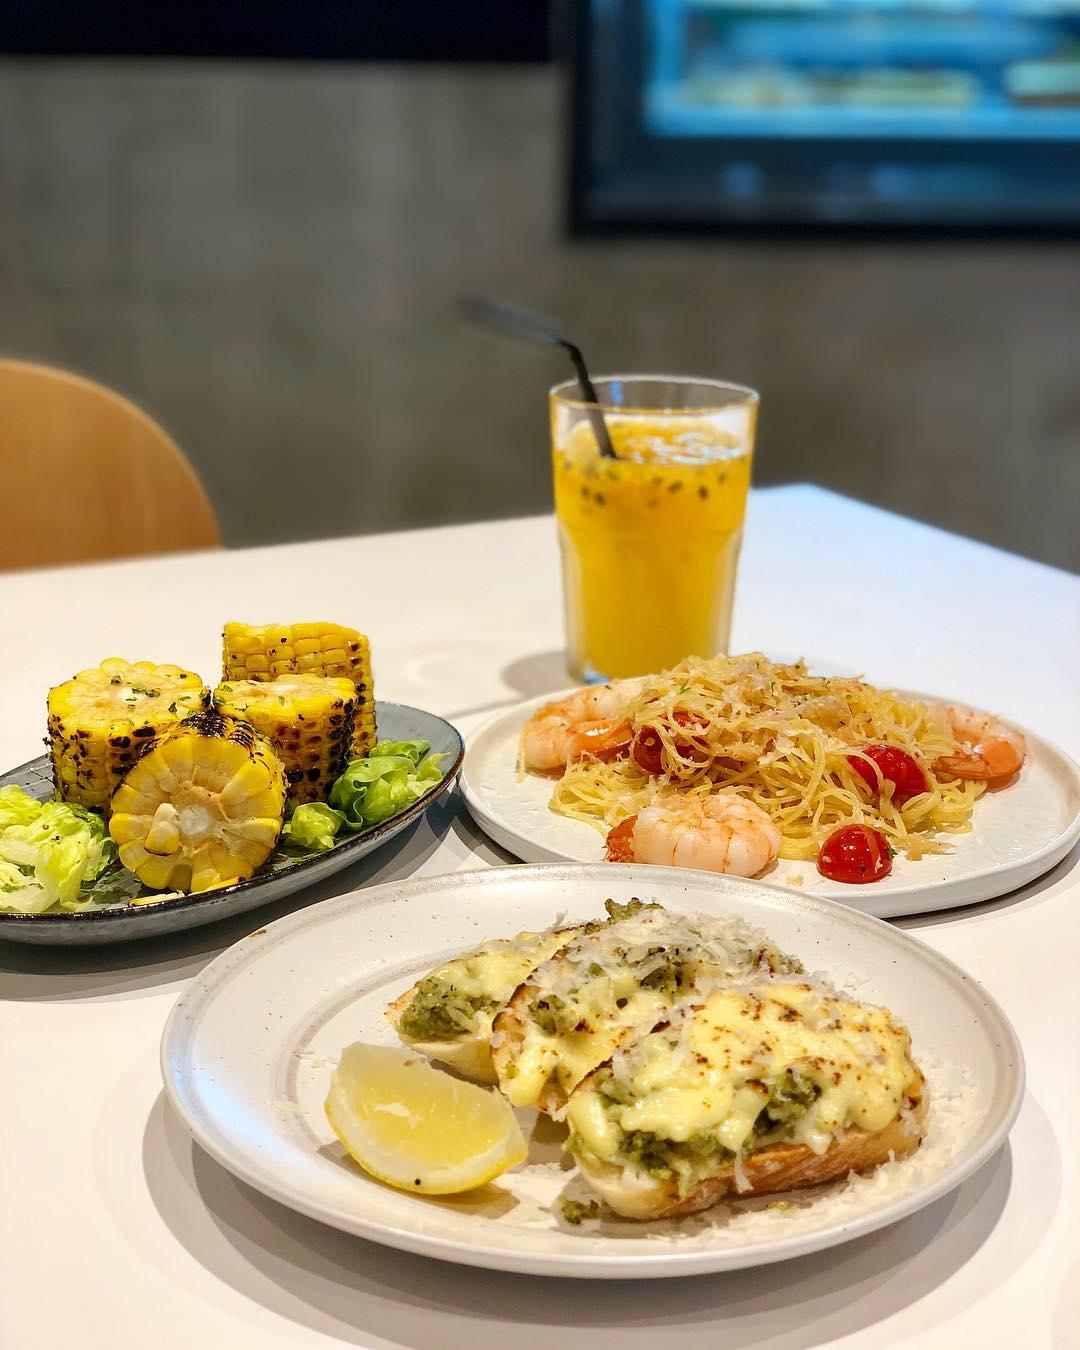 Century Square Food - Mahota Kitchen